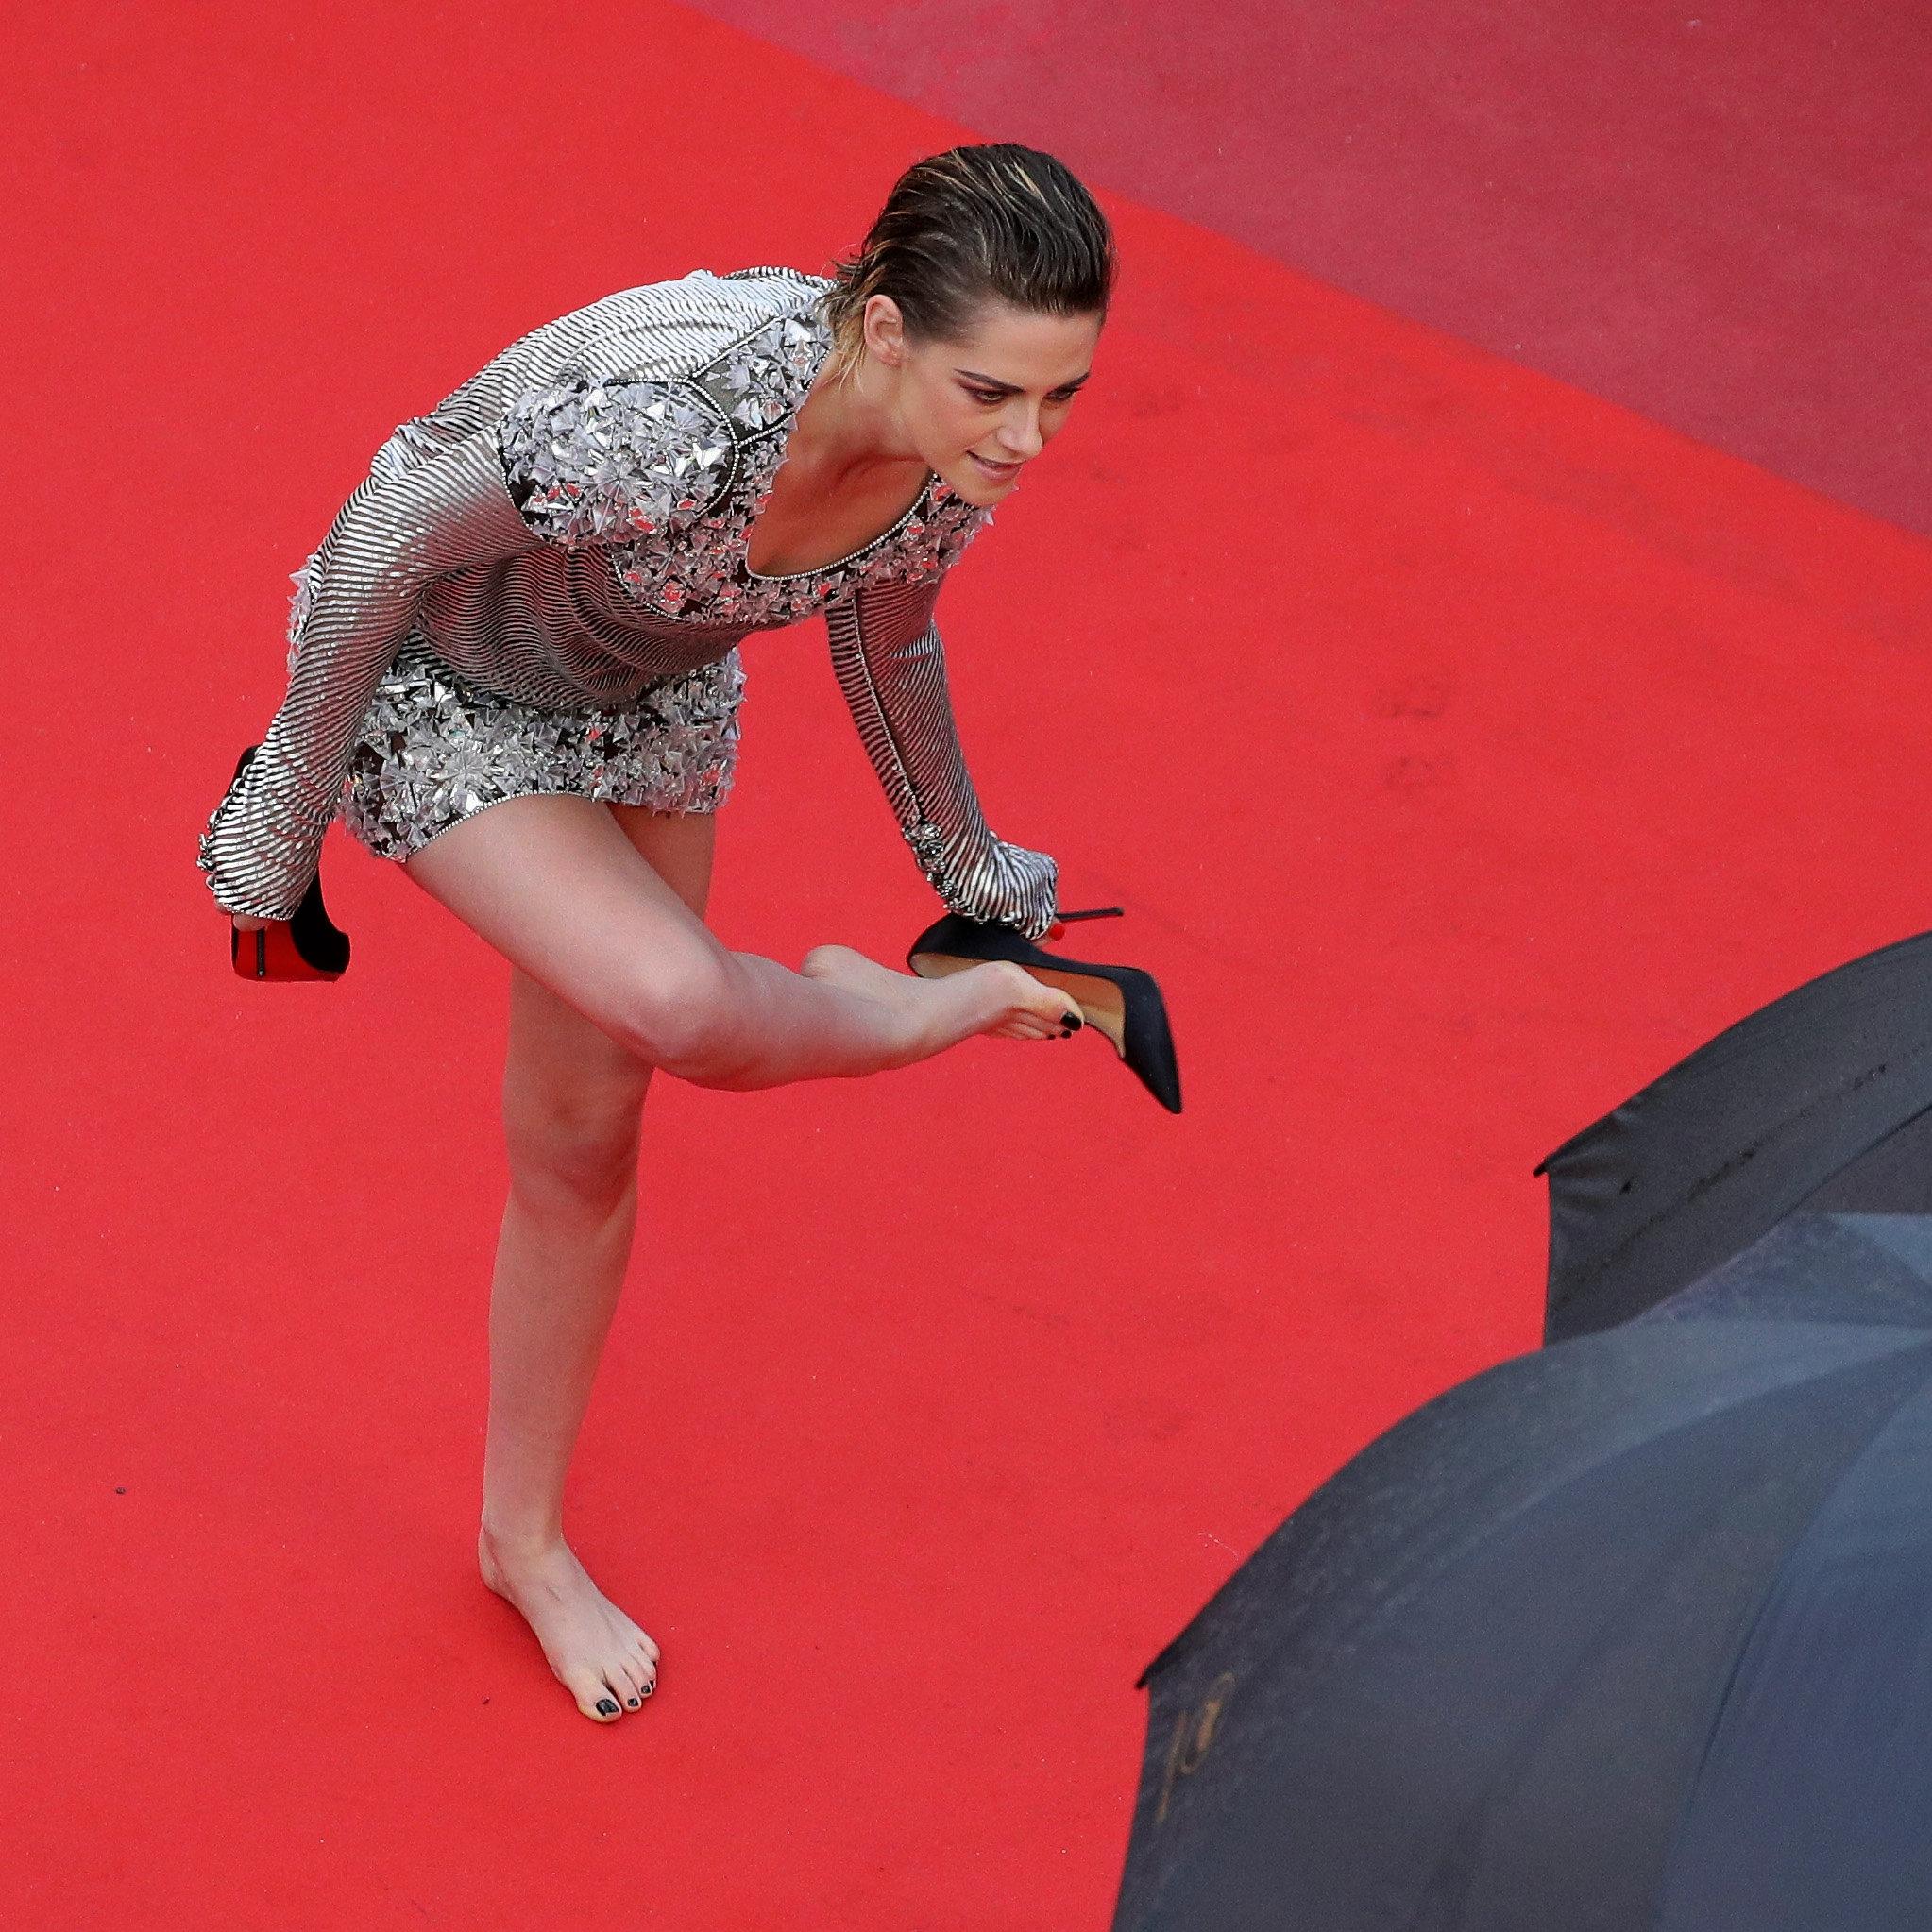 Kristen Stewart Defies Cannes 'Heels-Only